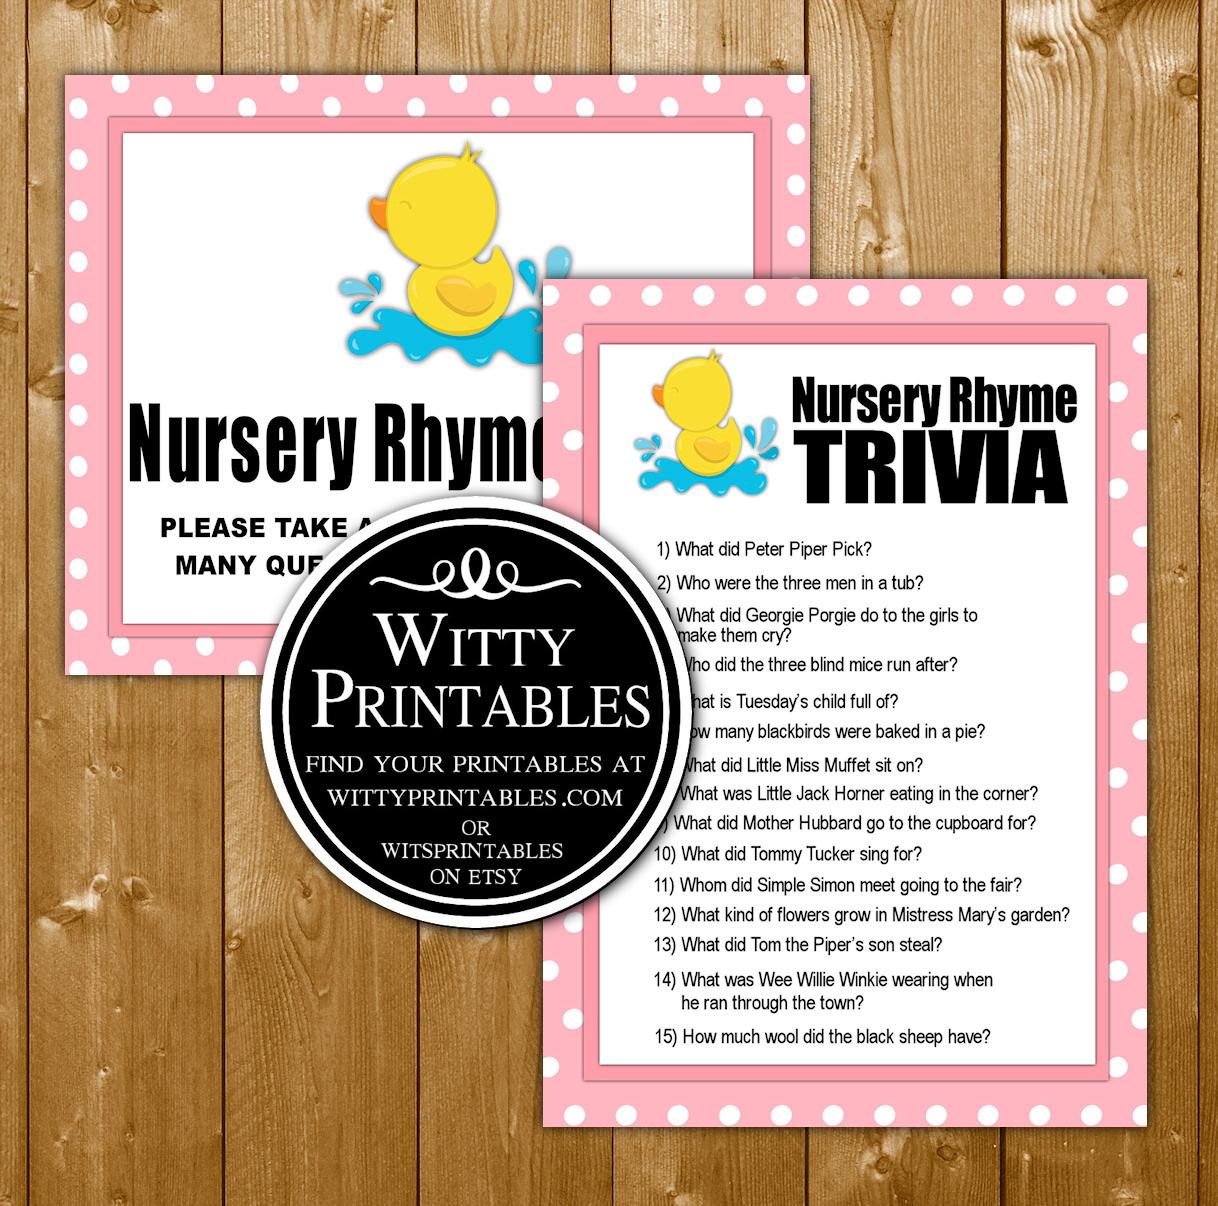 Nursery Rhyme Trivia Baby Shower Game Printable Pink Duck Girl Theme